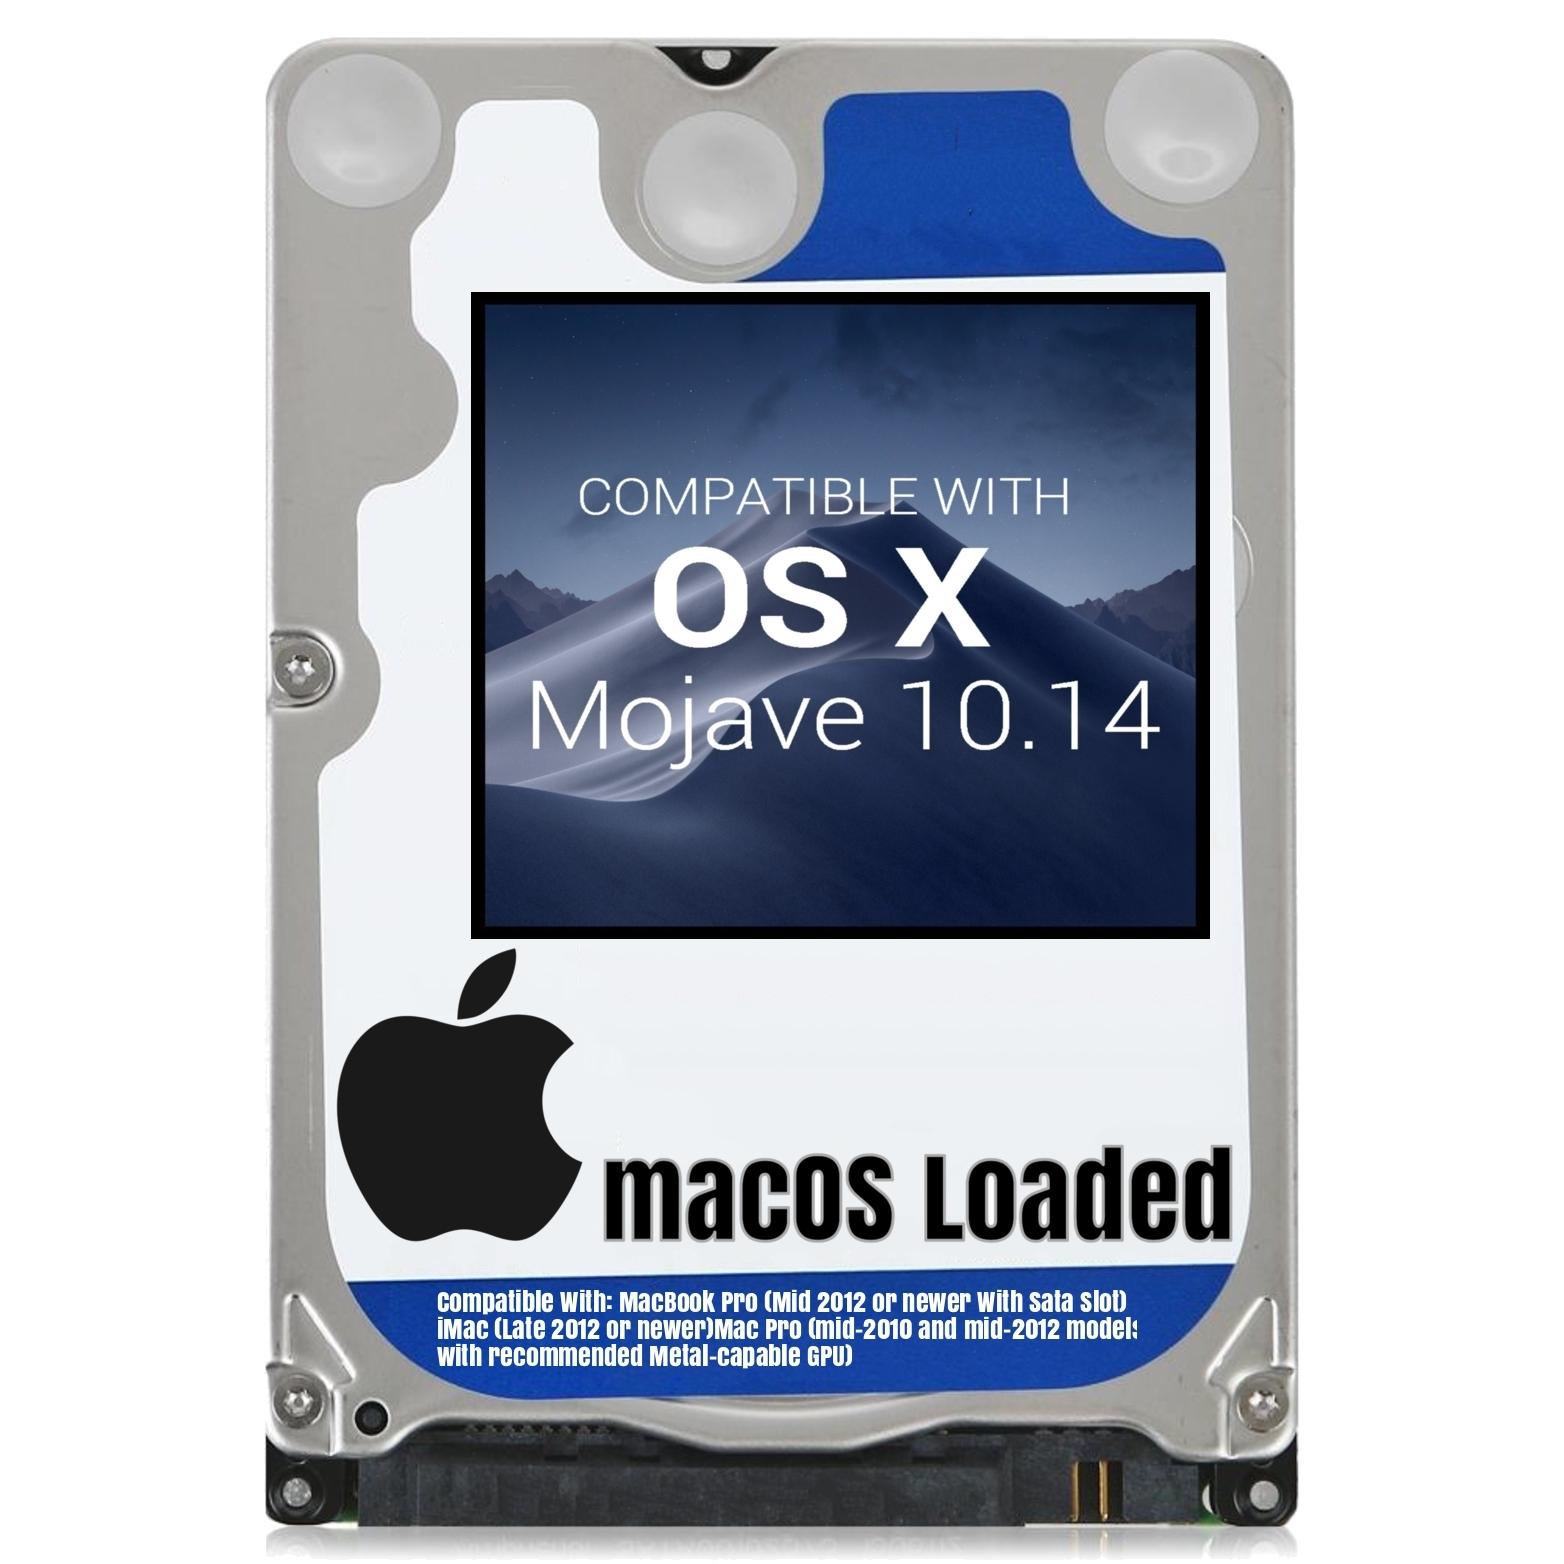 macOS Mac OS X 10.14 Mojave Preloaded on Sata HDD - $14.99 - $36.99